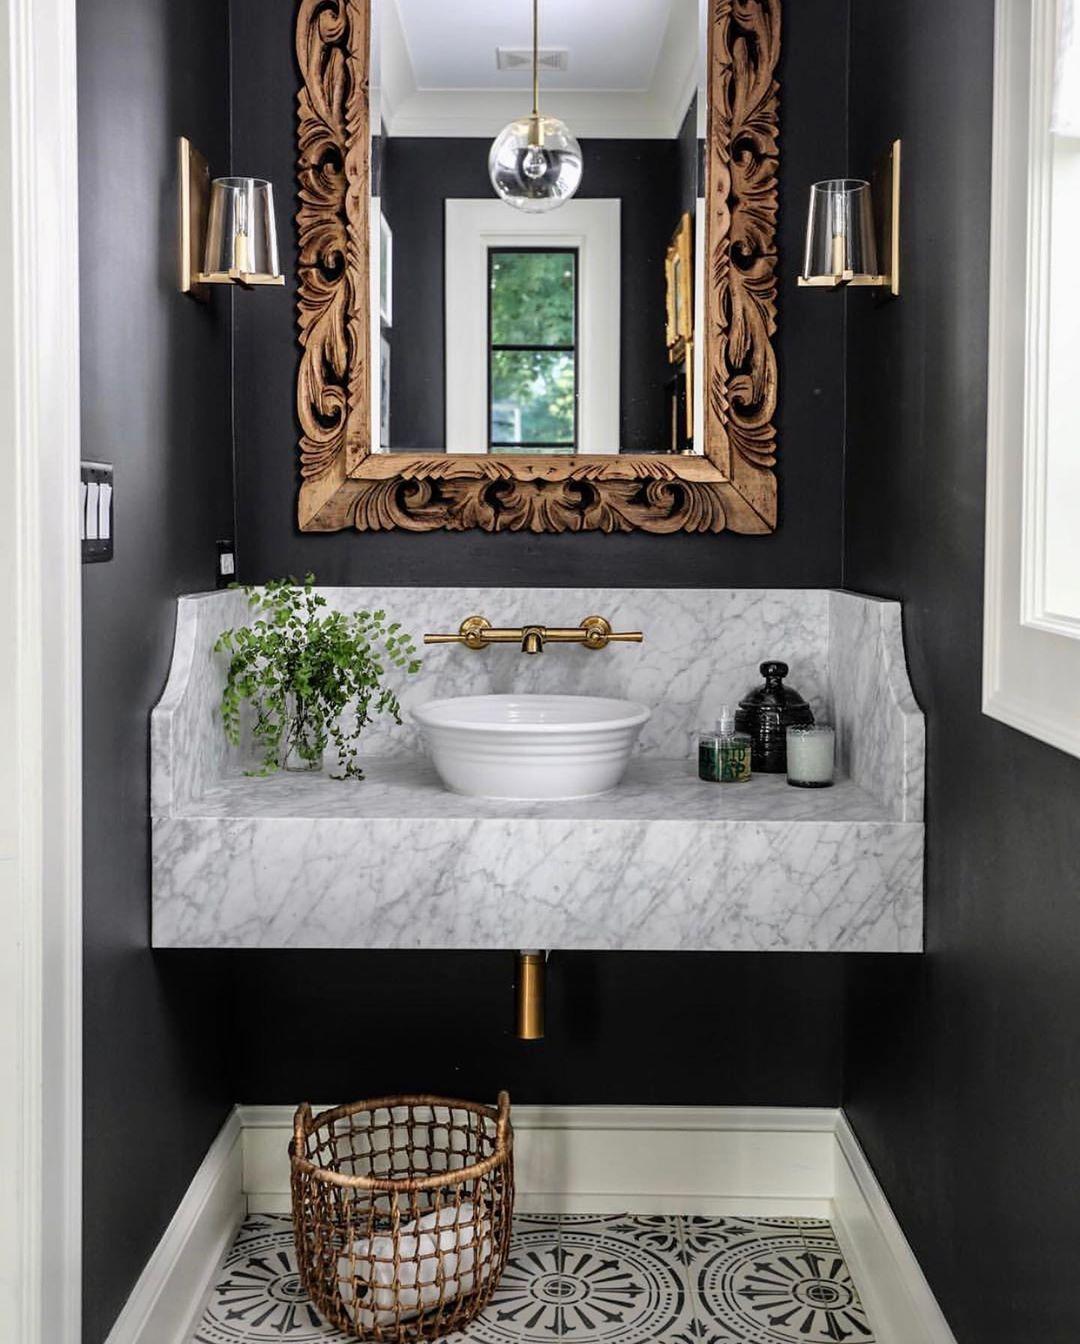 Peppertree Living On Instagram What S Your Favorite Detail Parkandoakdesign Bathroomdesign Bath In 2020 Modern Powder Rooms Powder Room Design Bathroom Trends